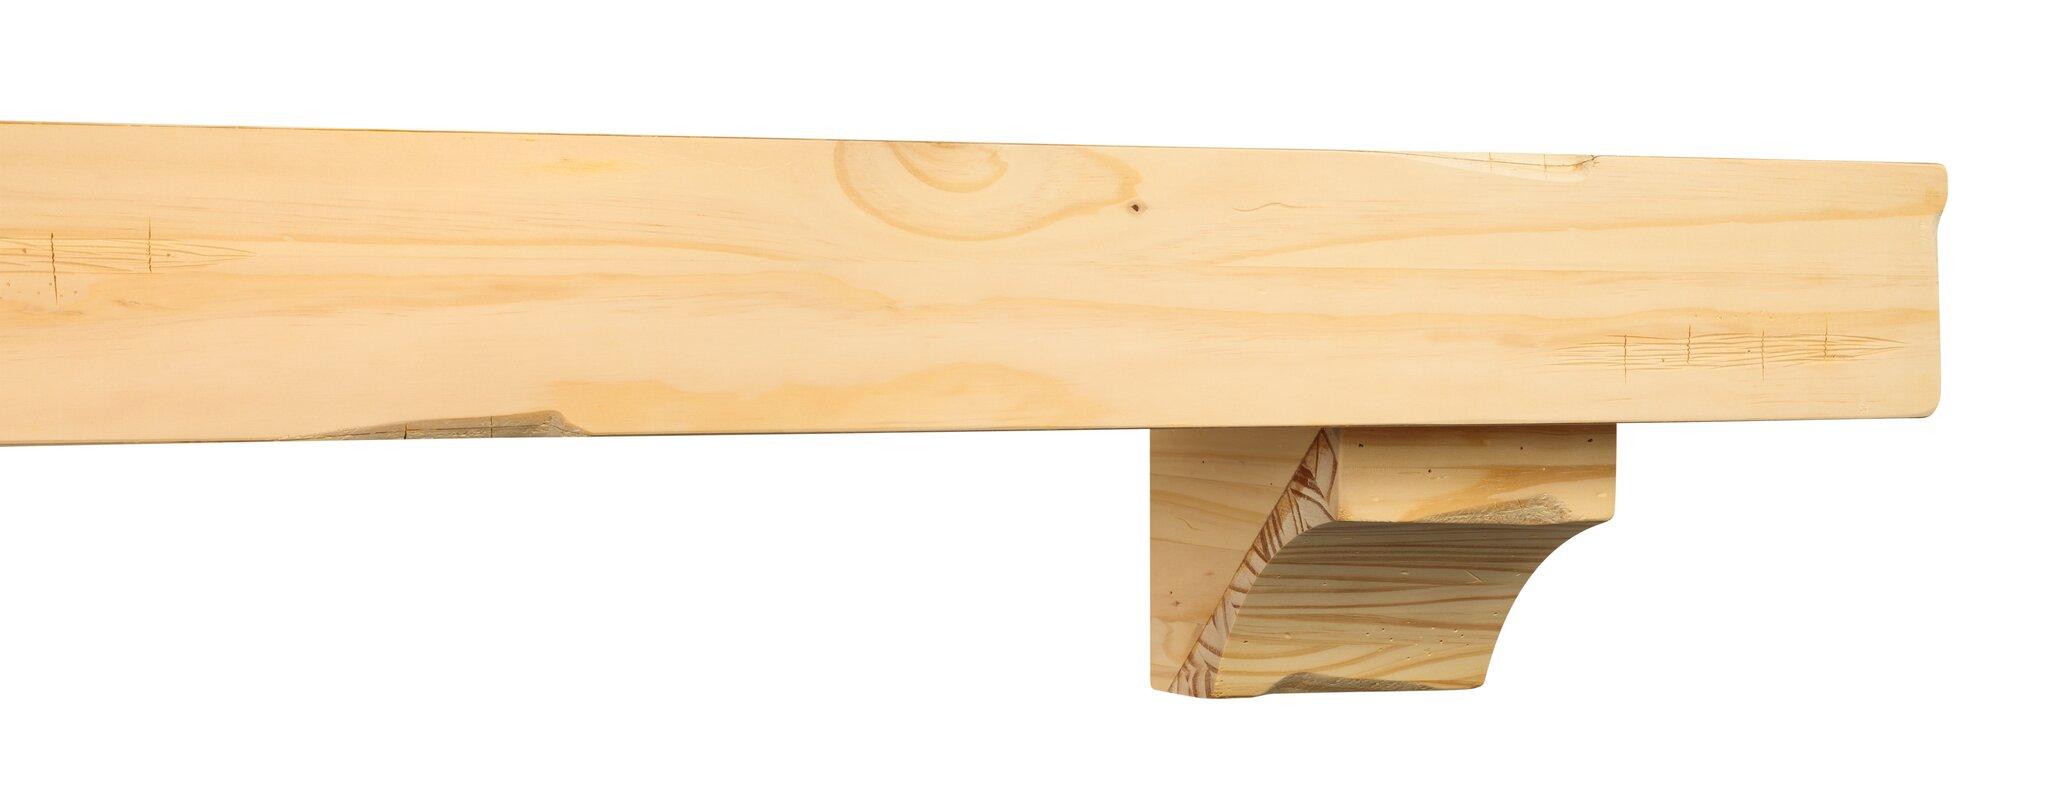 dogberry home reviews shelf pdx fireplace mantel collections improvement modern wayfair